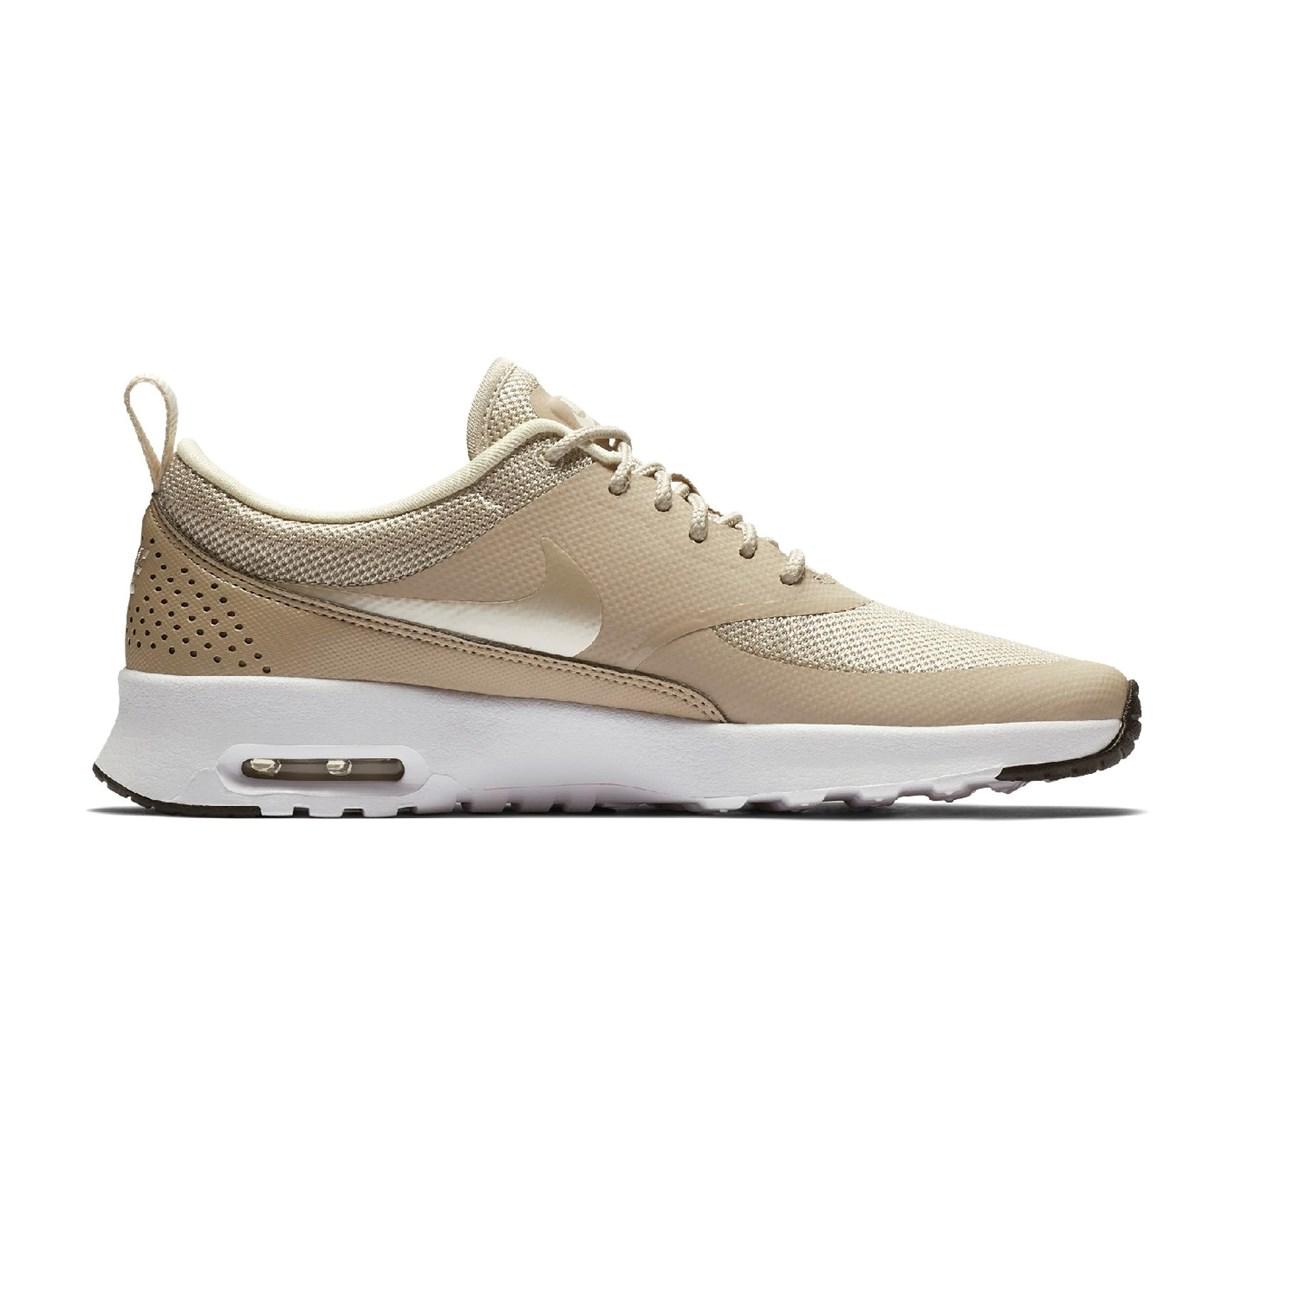 NIKE AIR MAX THEA W   Sportstyle Παπούτσια  d70d9d15176